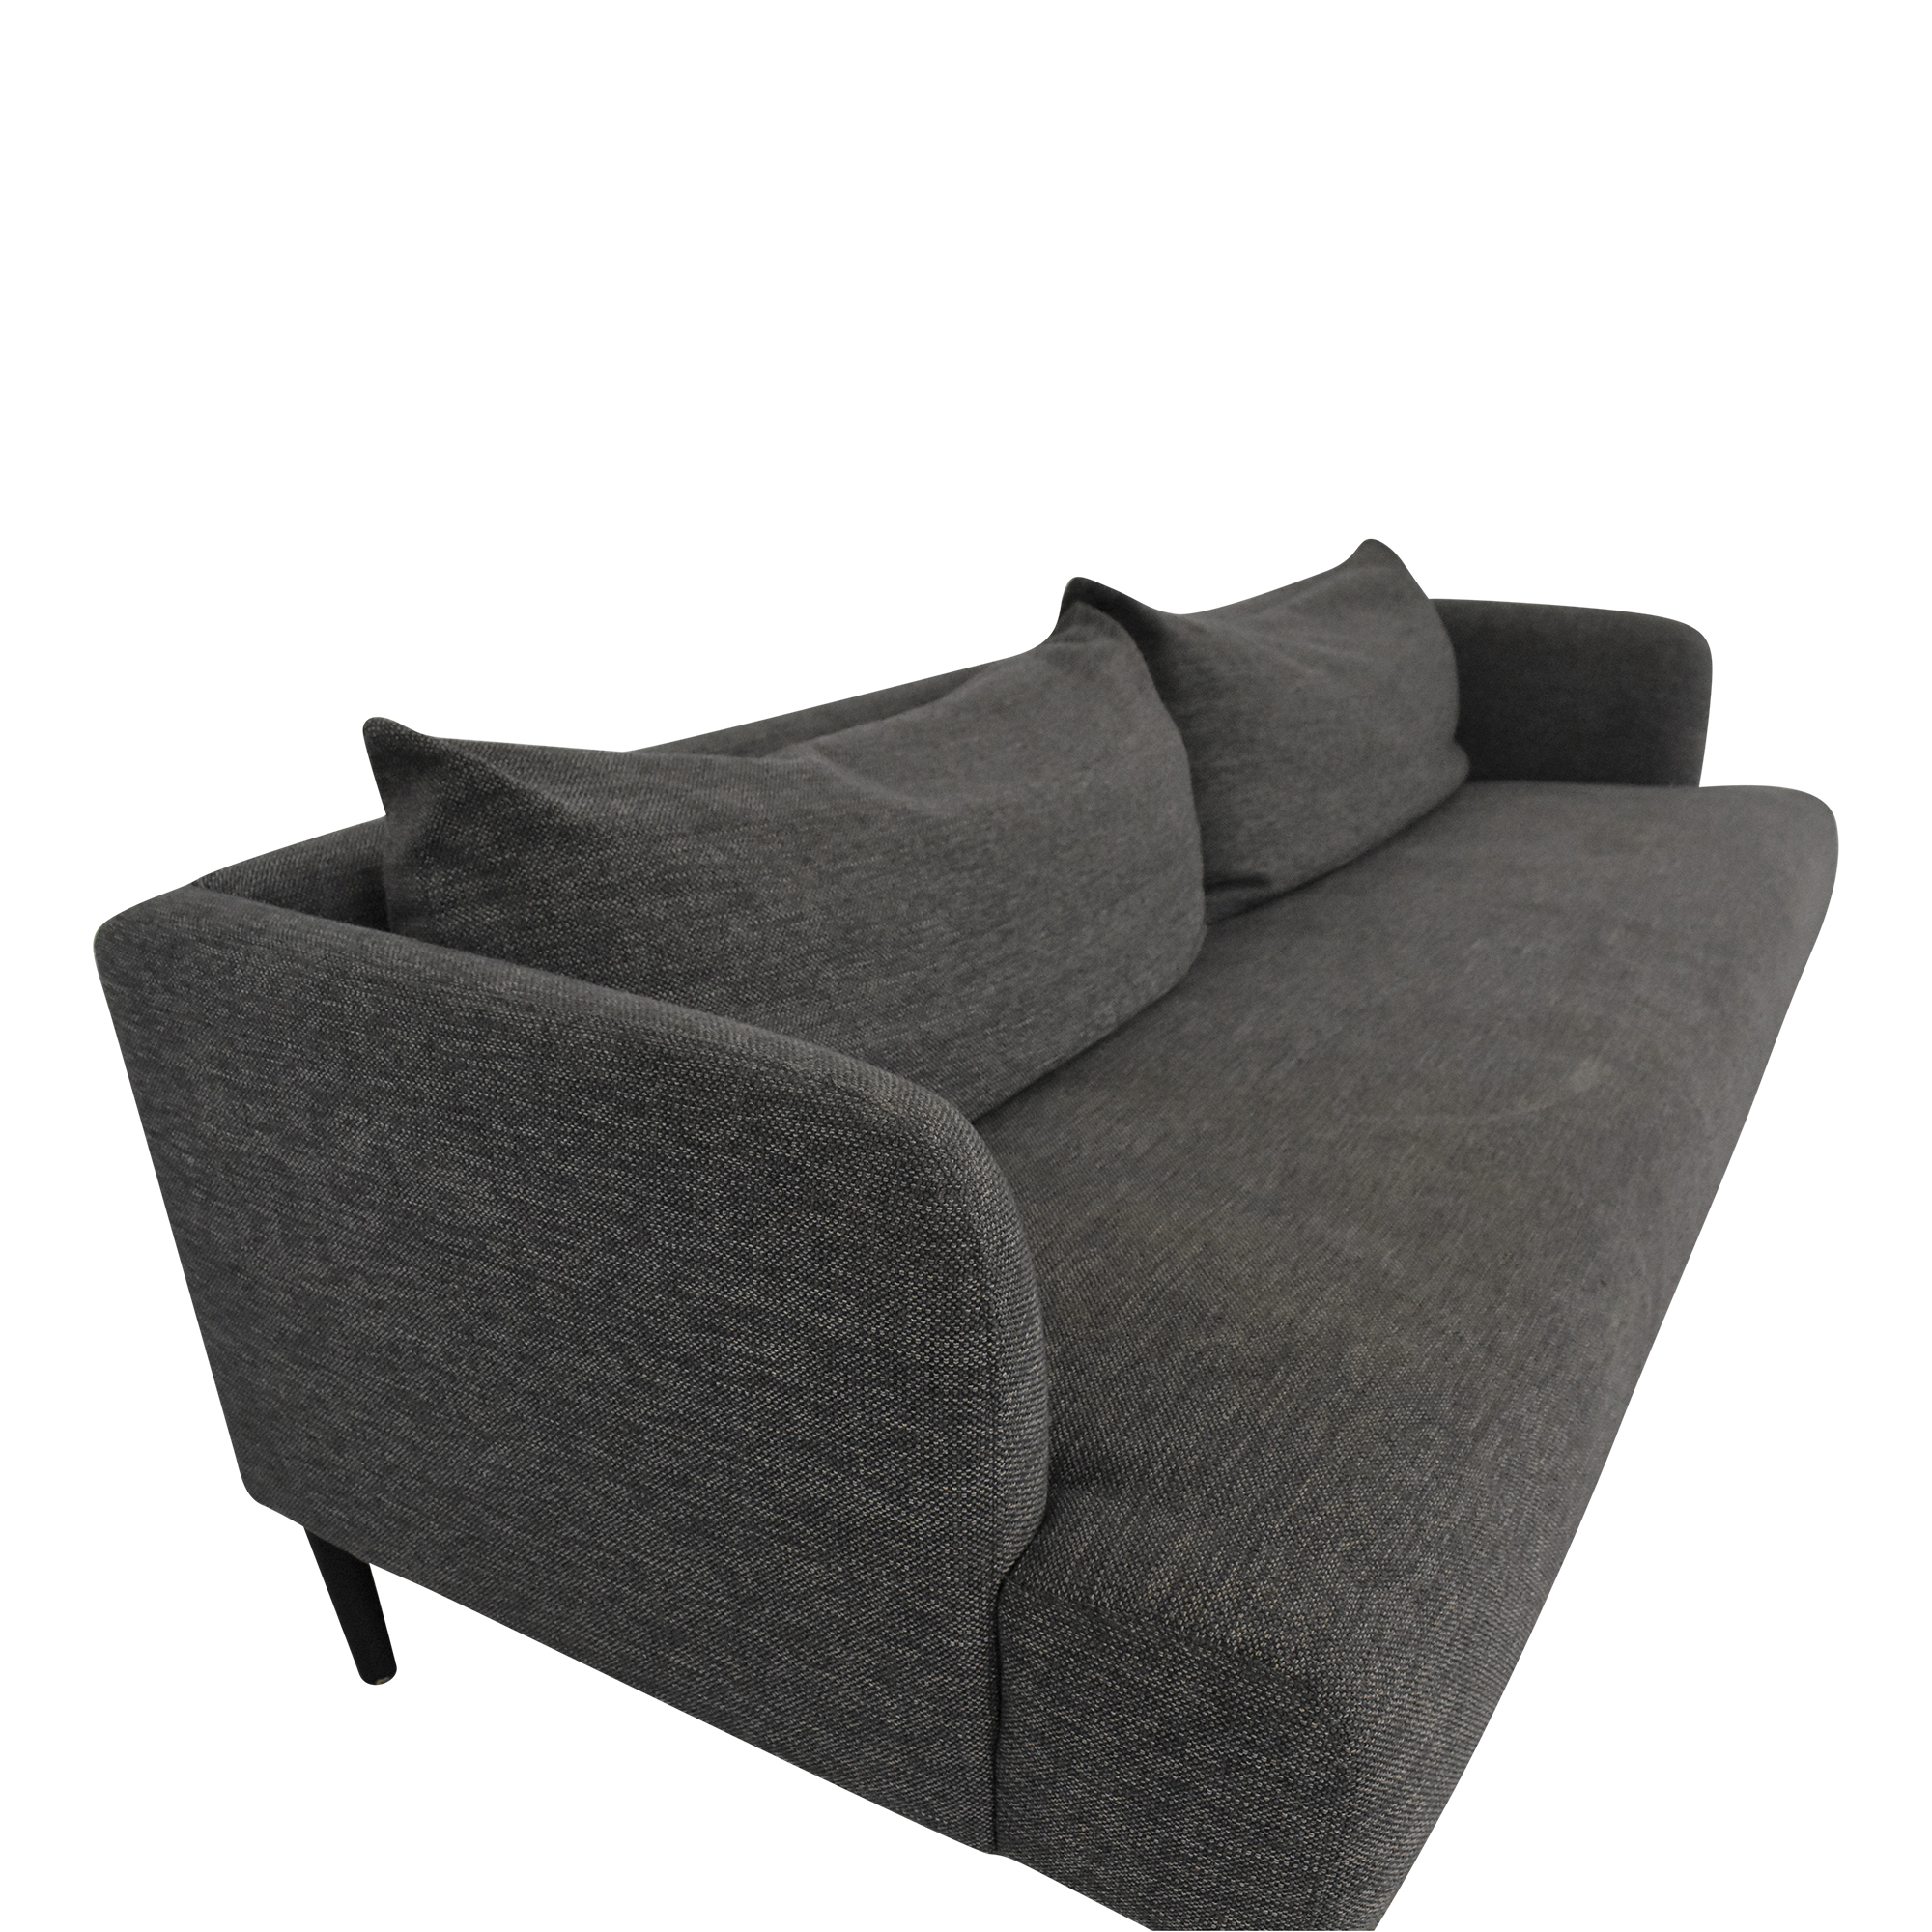 CB2 CB2 Ronan Bench Cushion Sofa Sofas